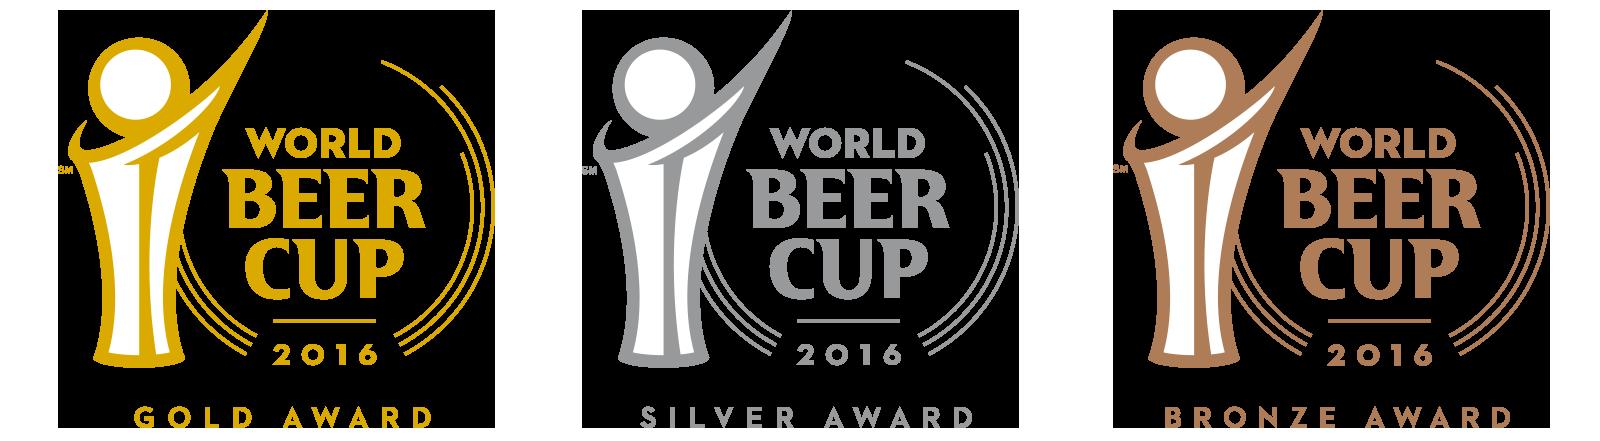 World Beer Cup Logos